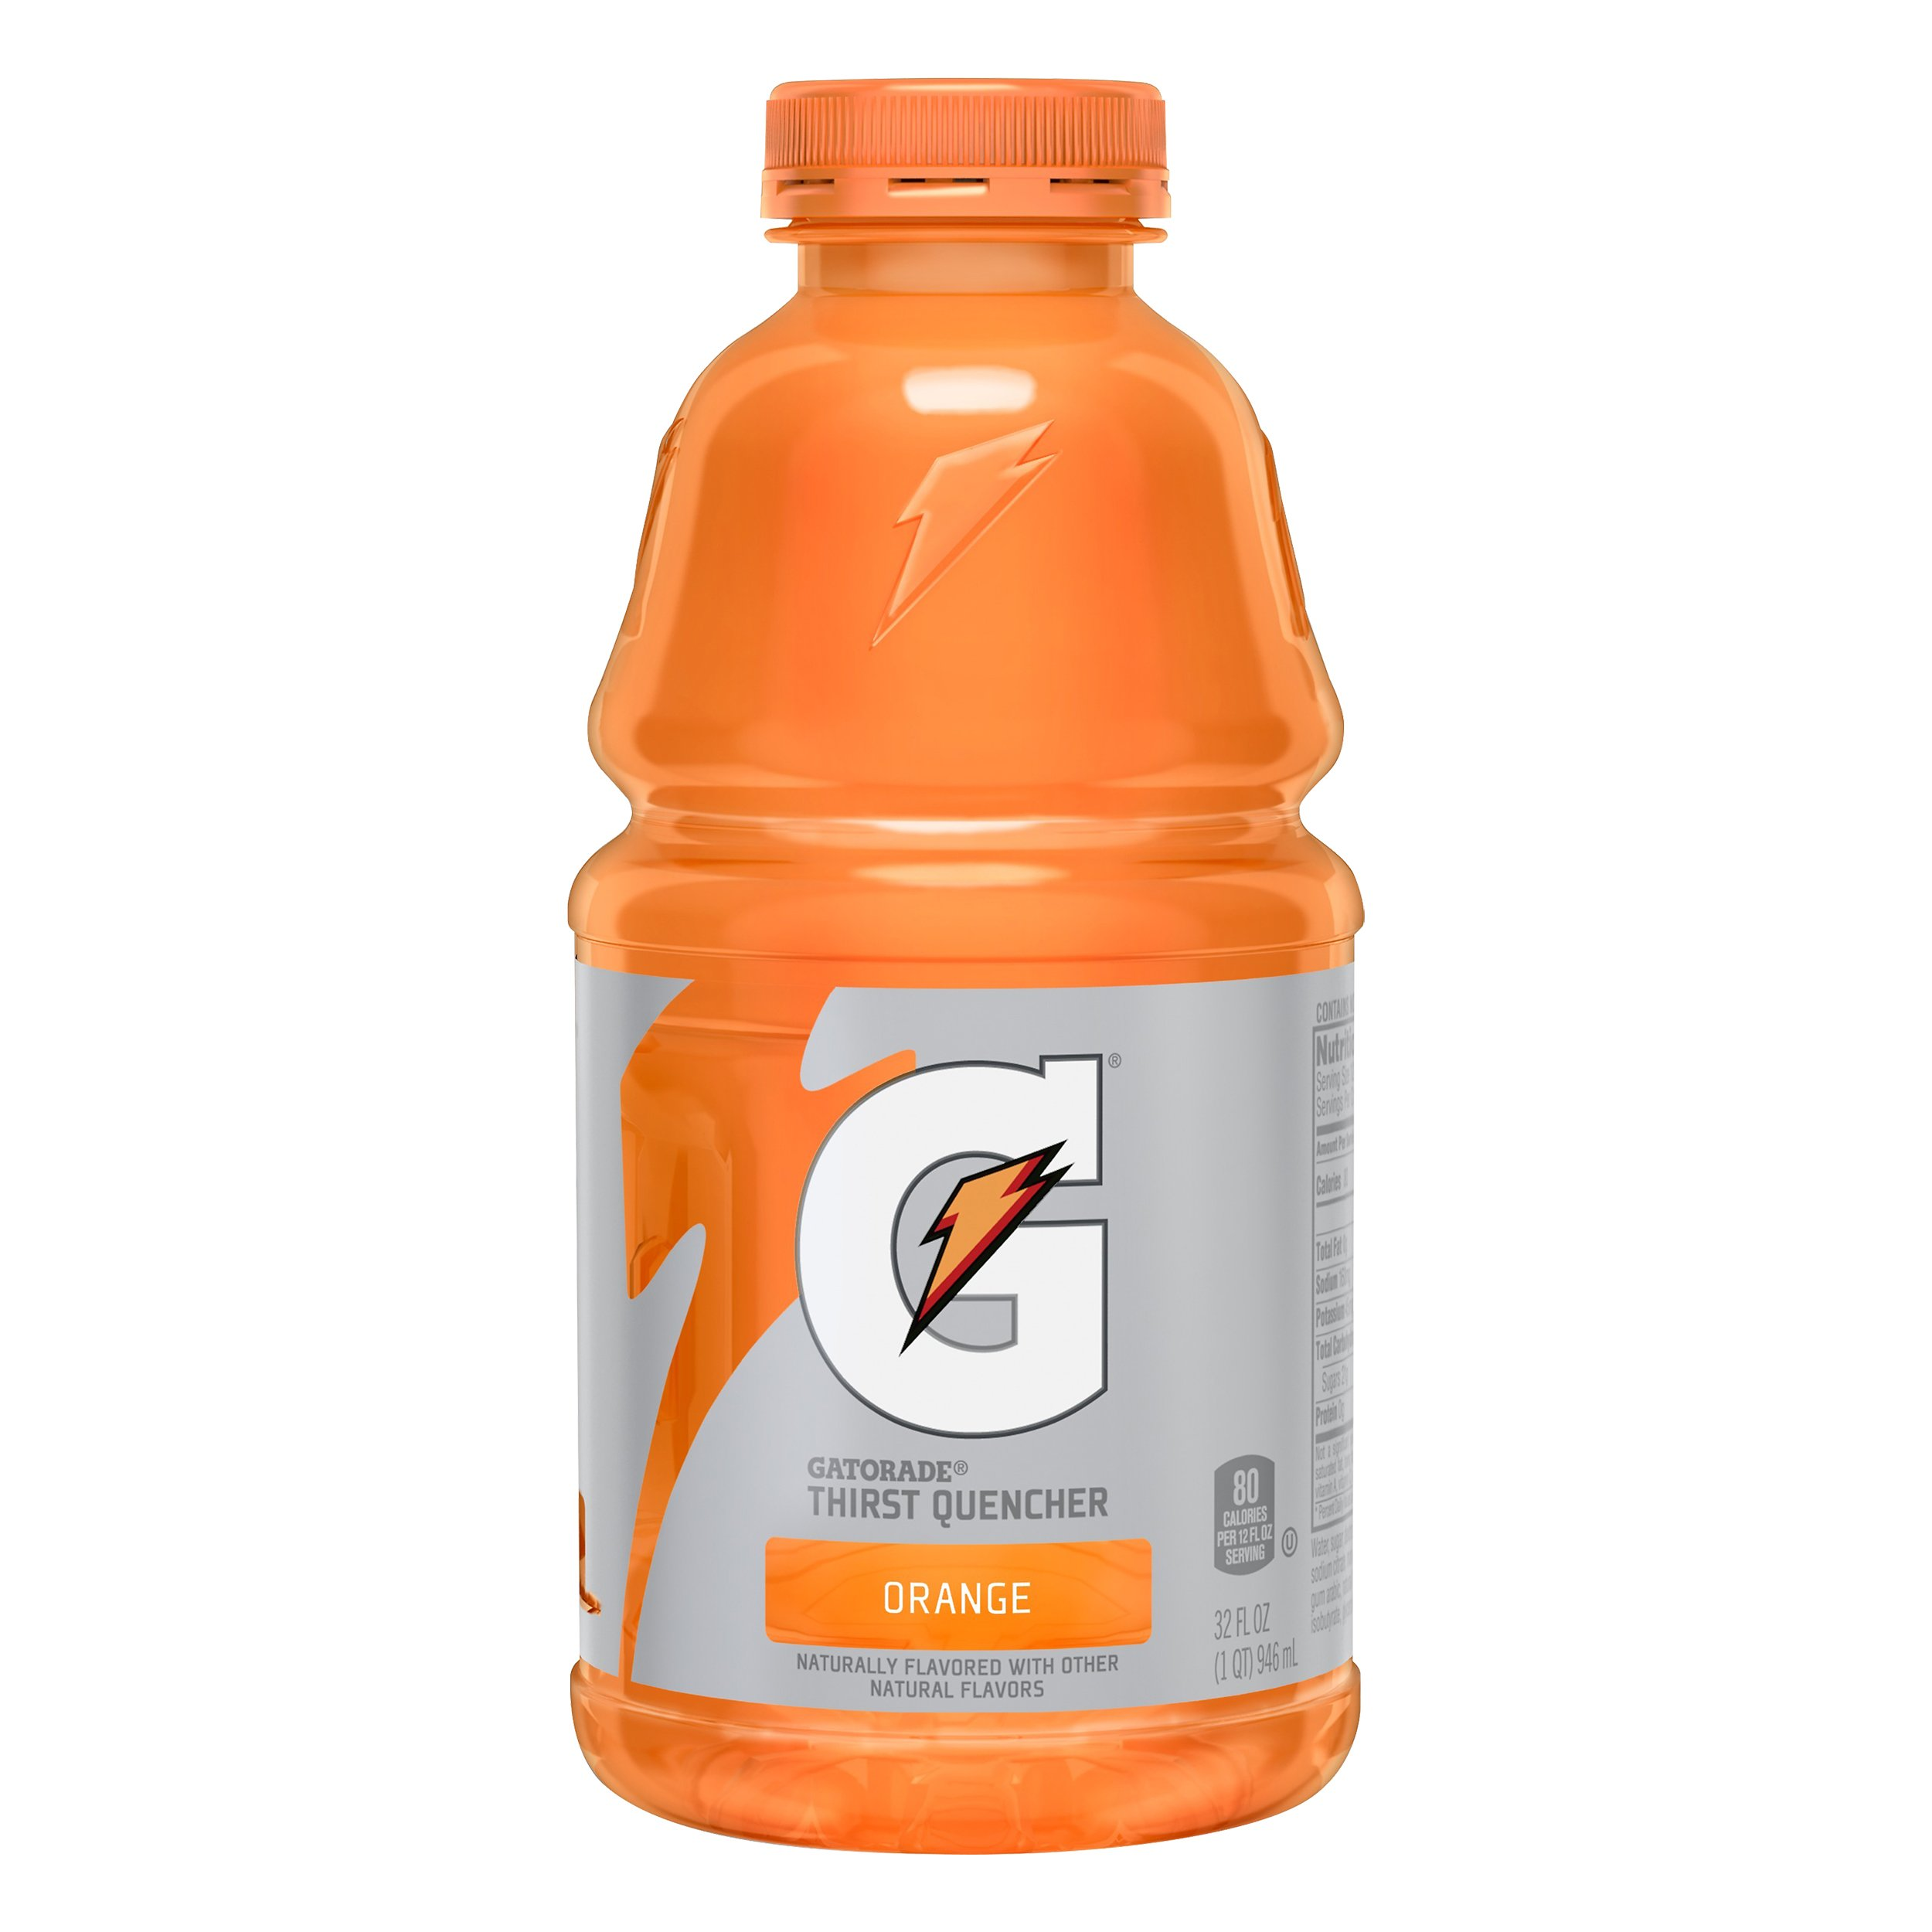 Gatorade Orange Sports Drink 32.0 OZ 12-Pack